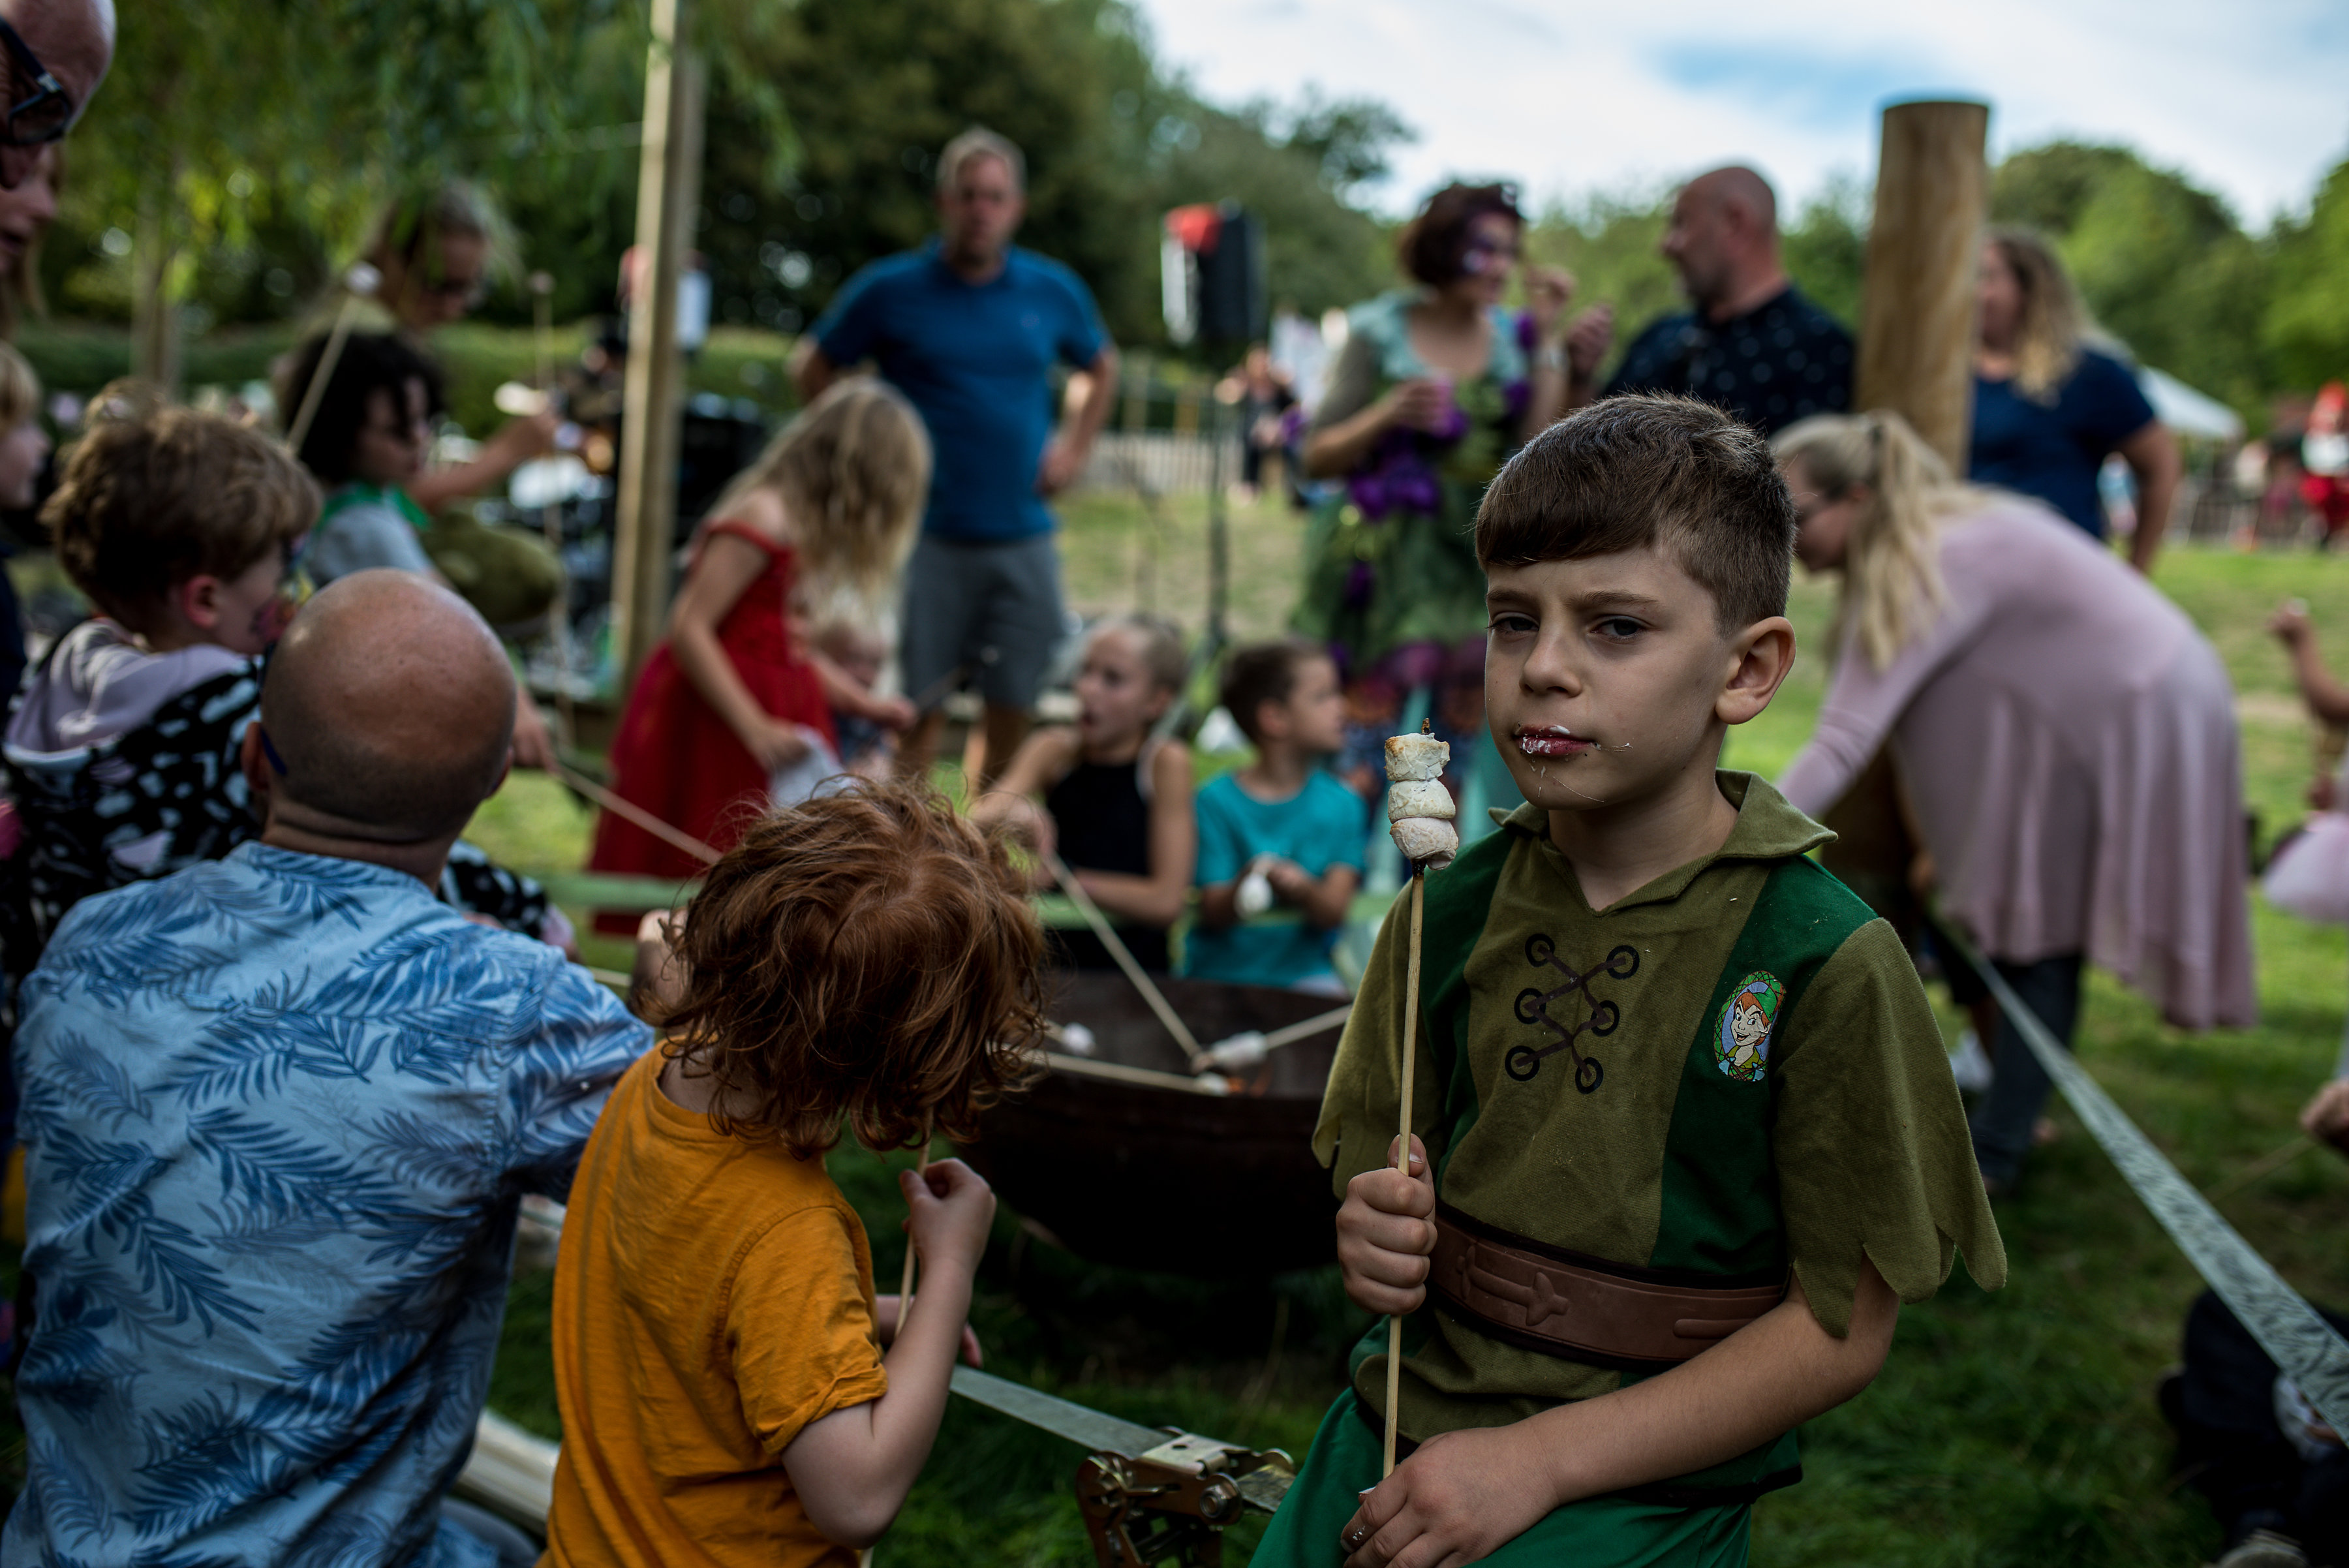 Anstey Fairy Festival